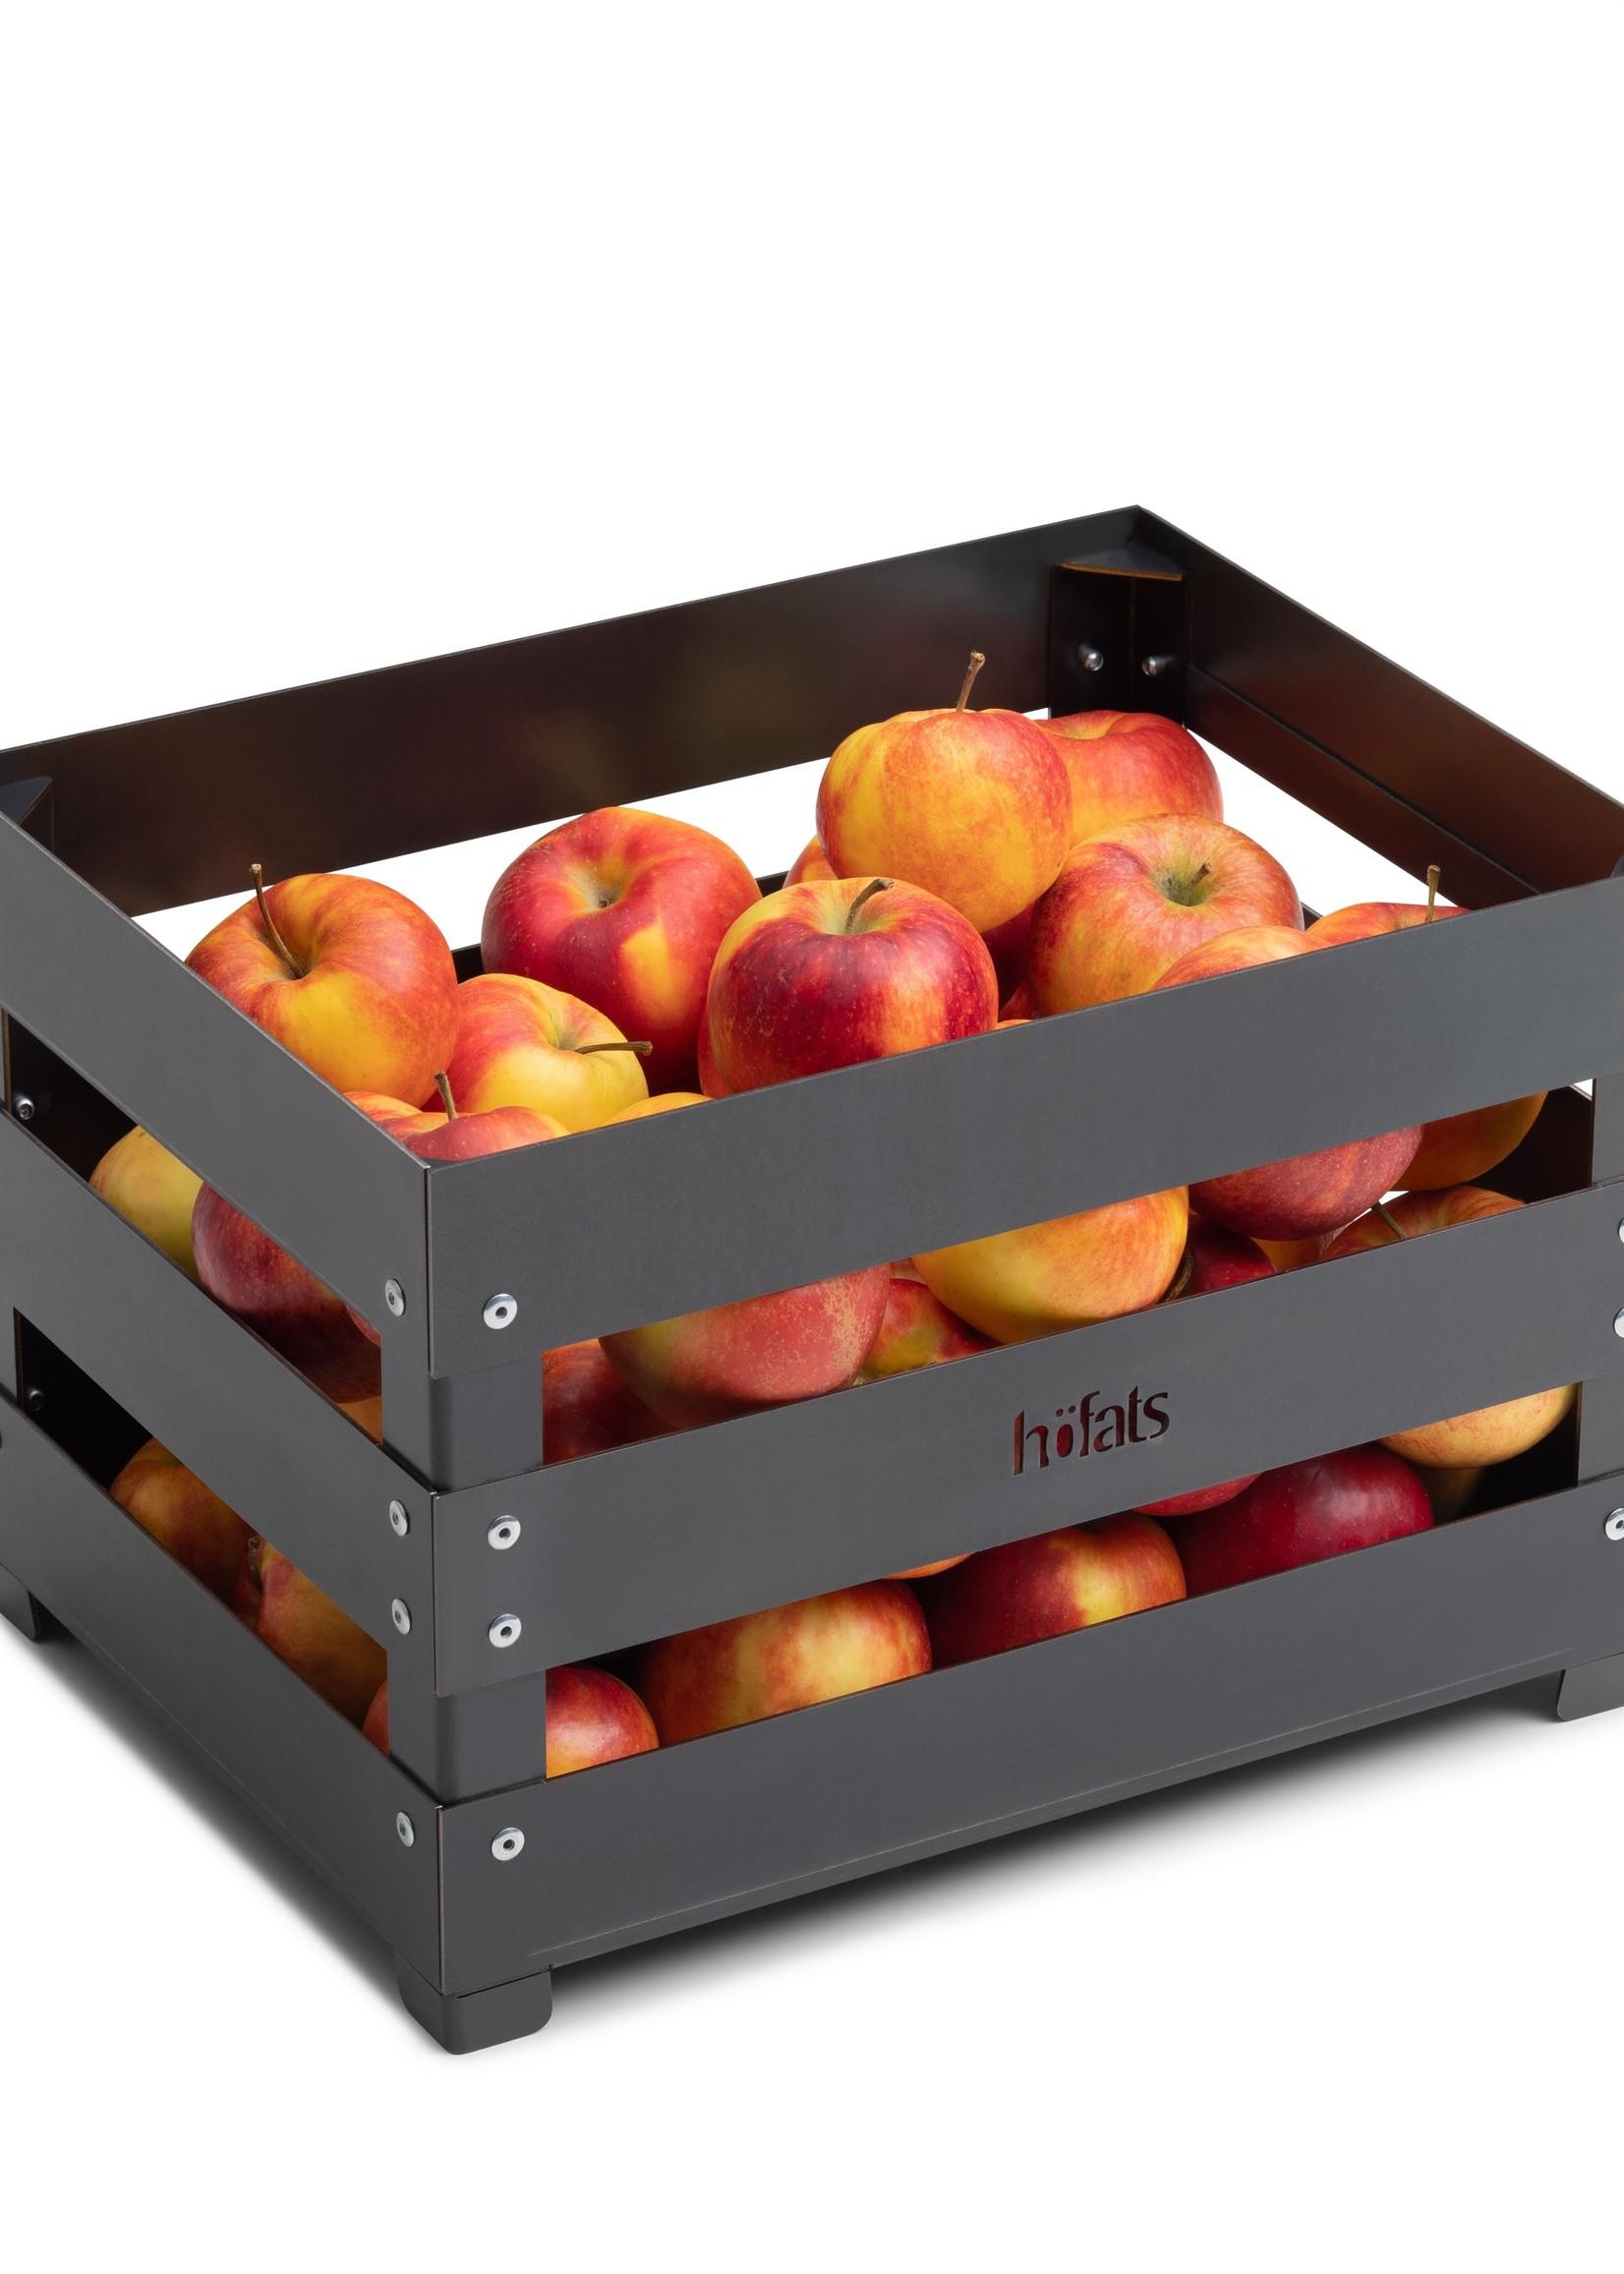 Höfats Crate Vuurkorf Multifunctioneel